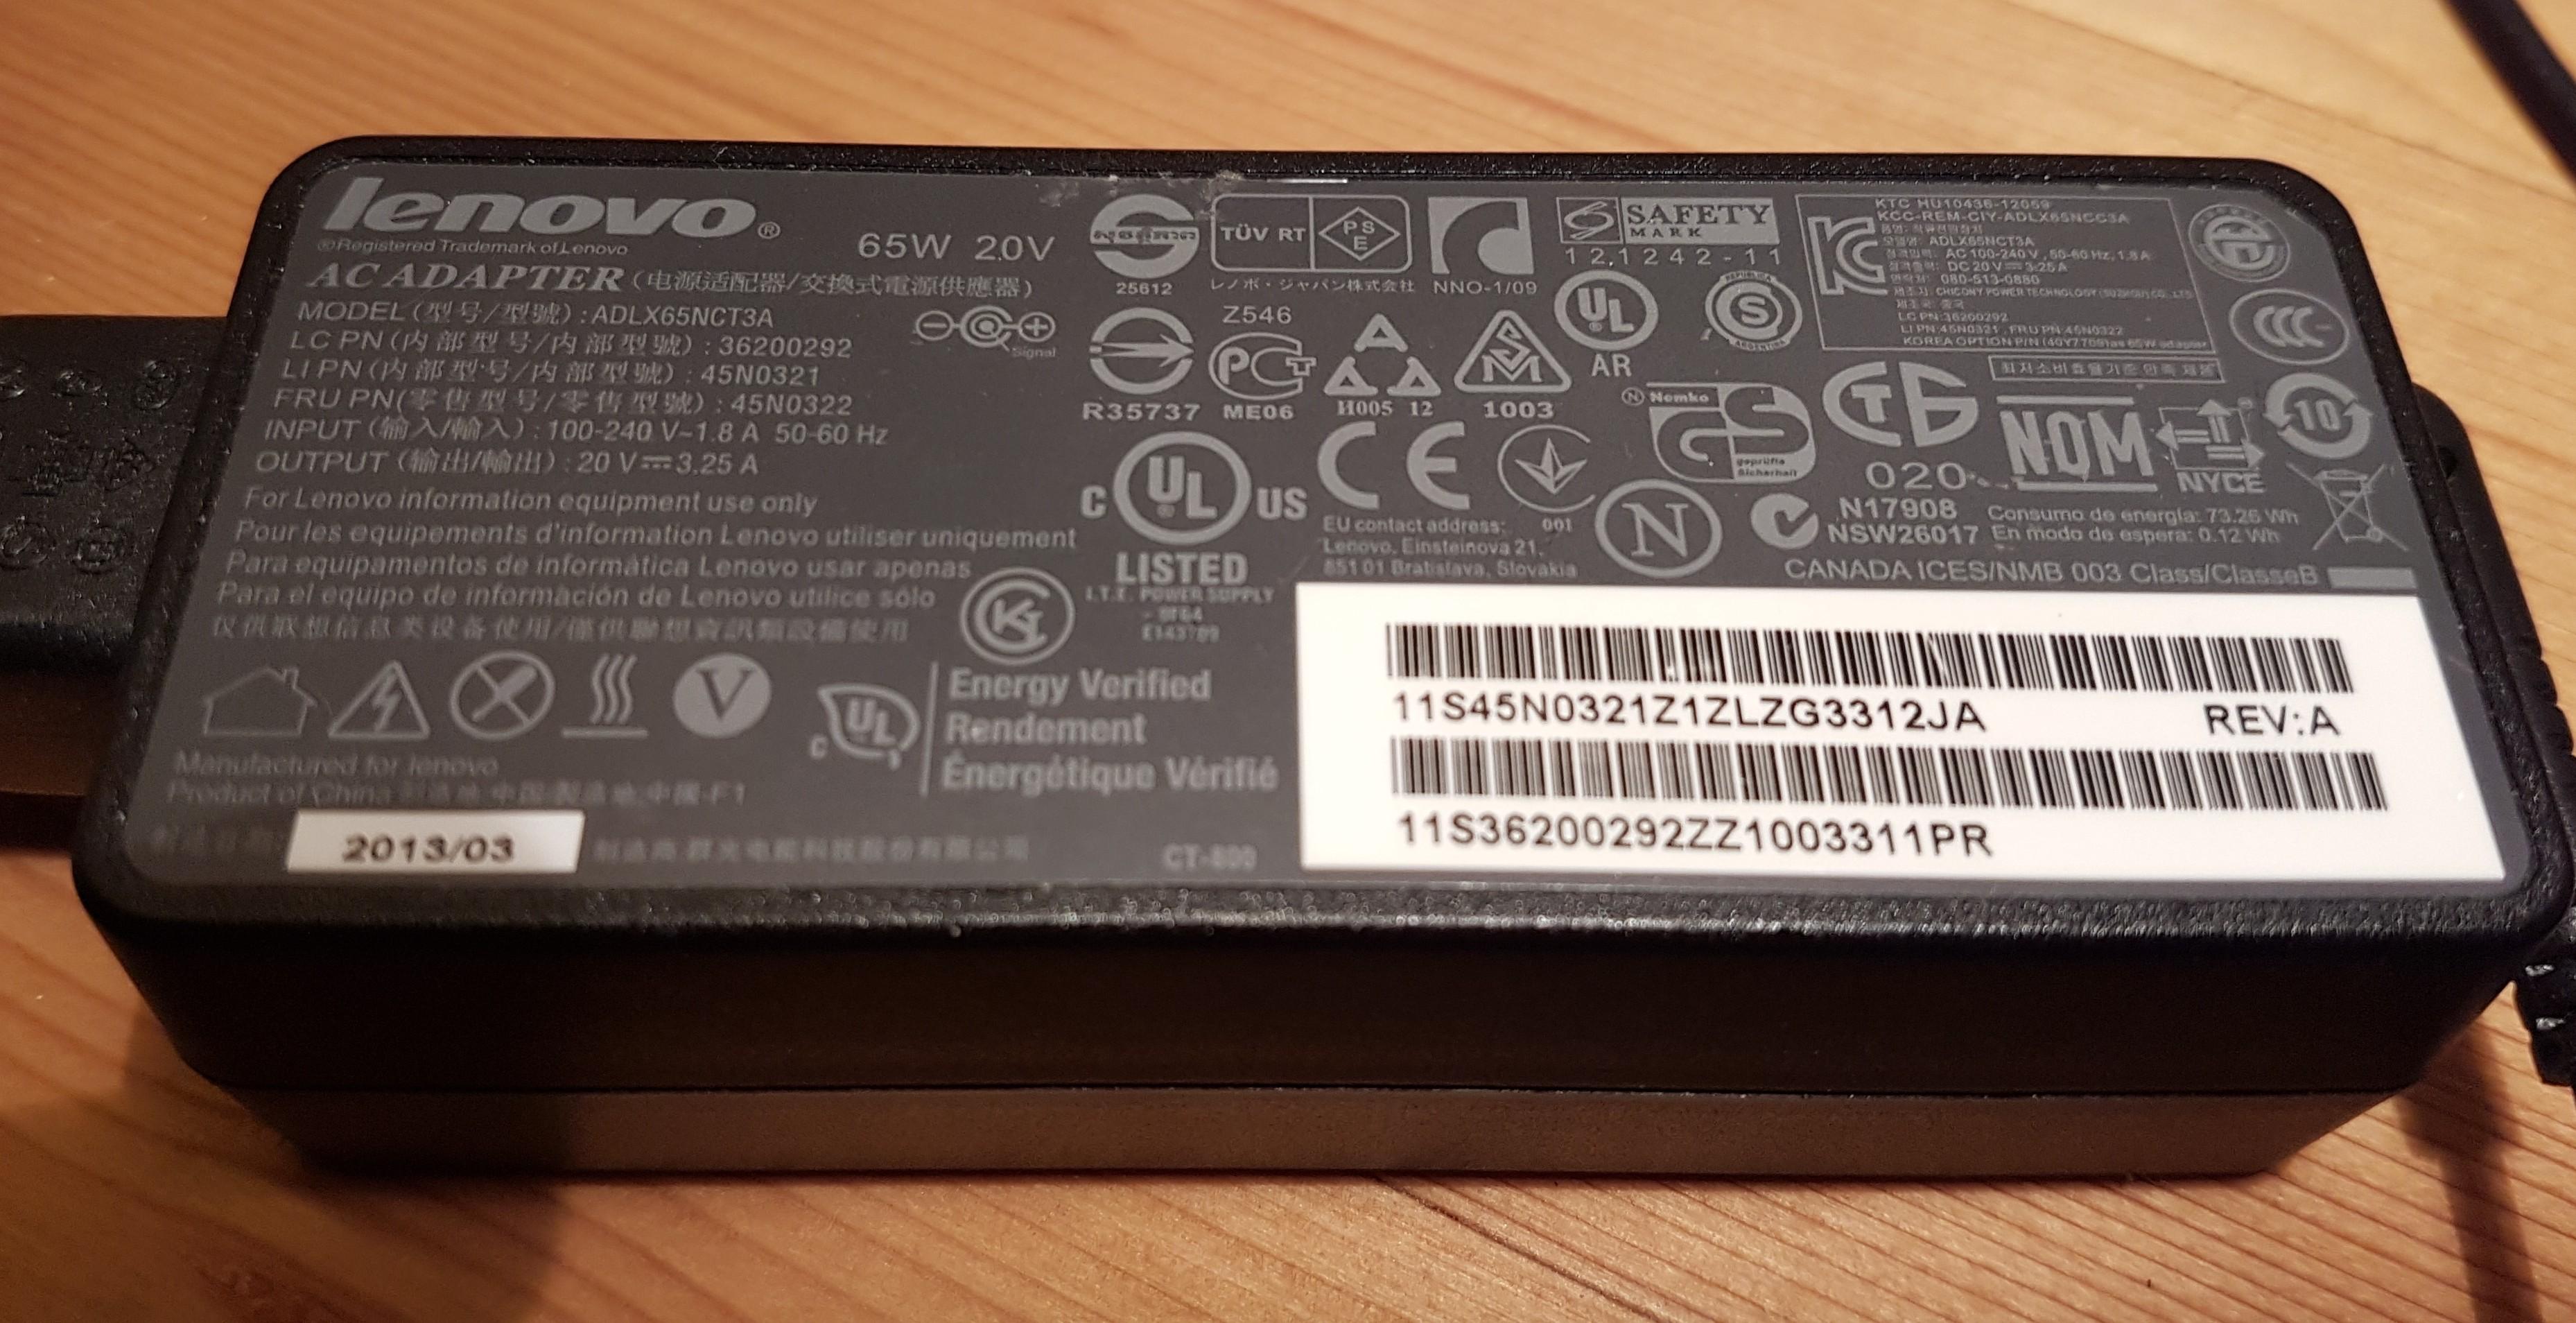 Lenovo Power Adapter AC 65W 20V